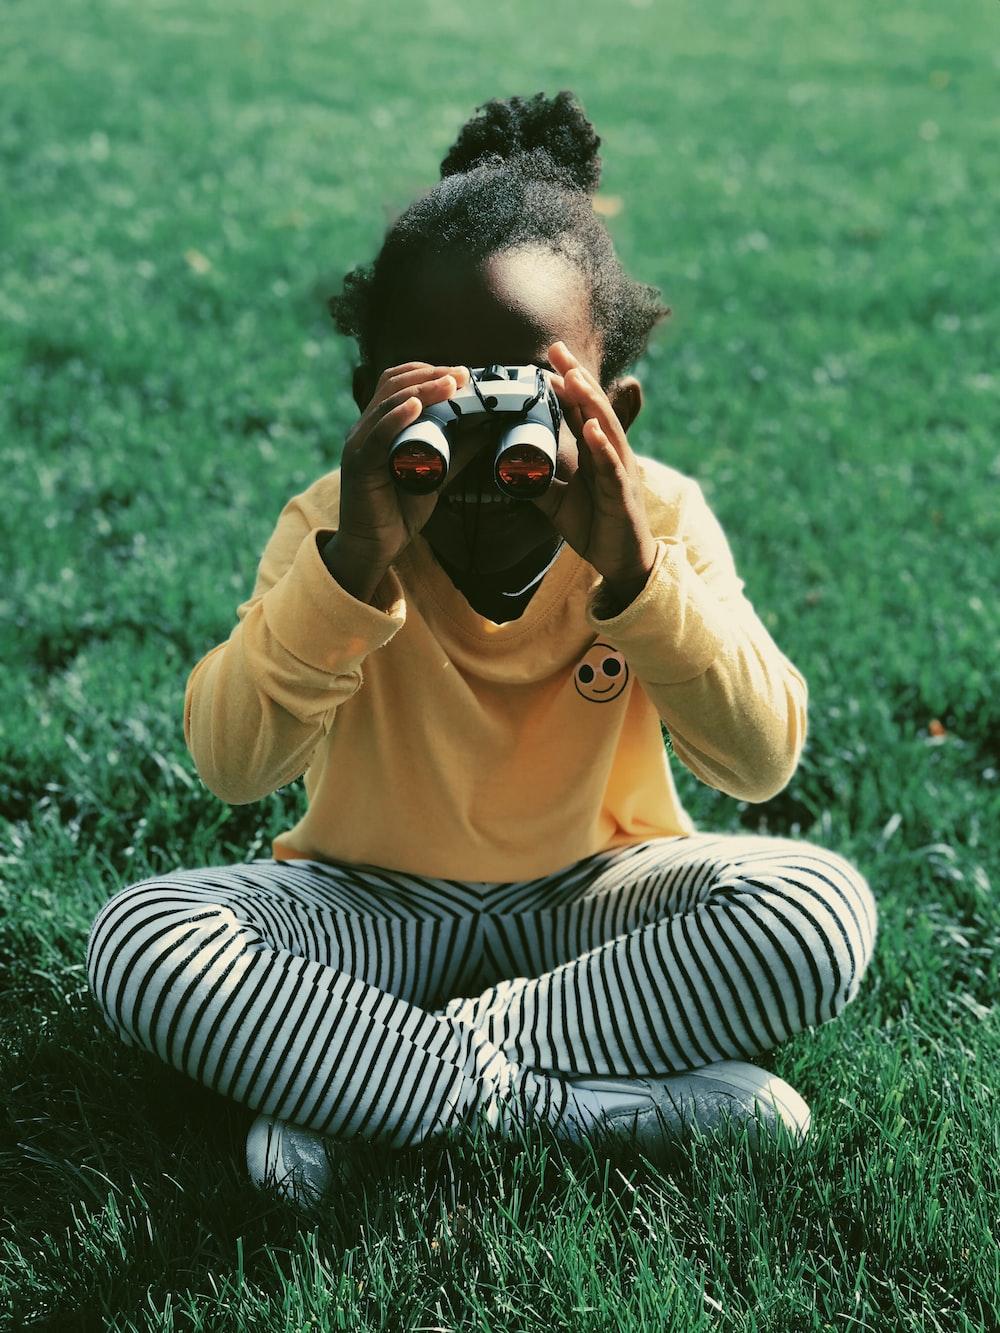 girl sitting on grass field holding binoculars